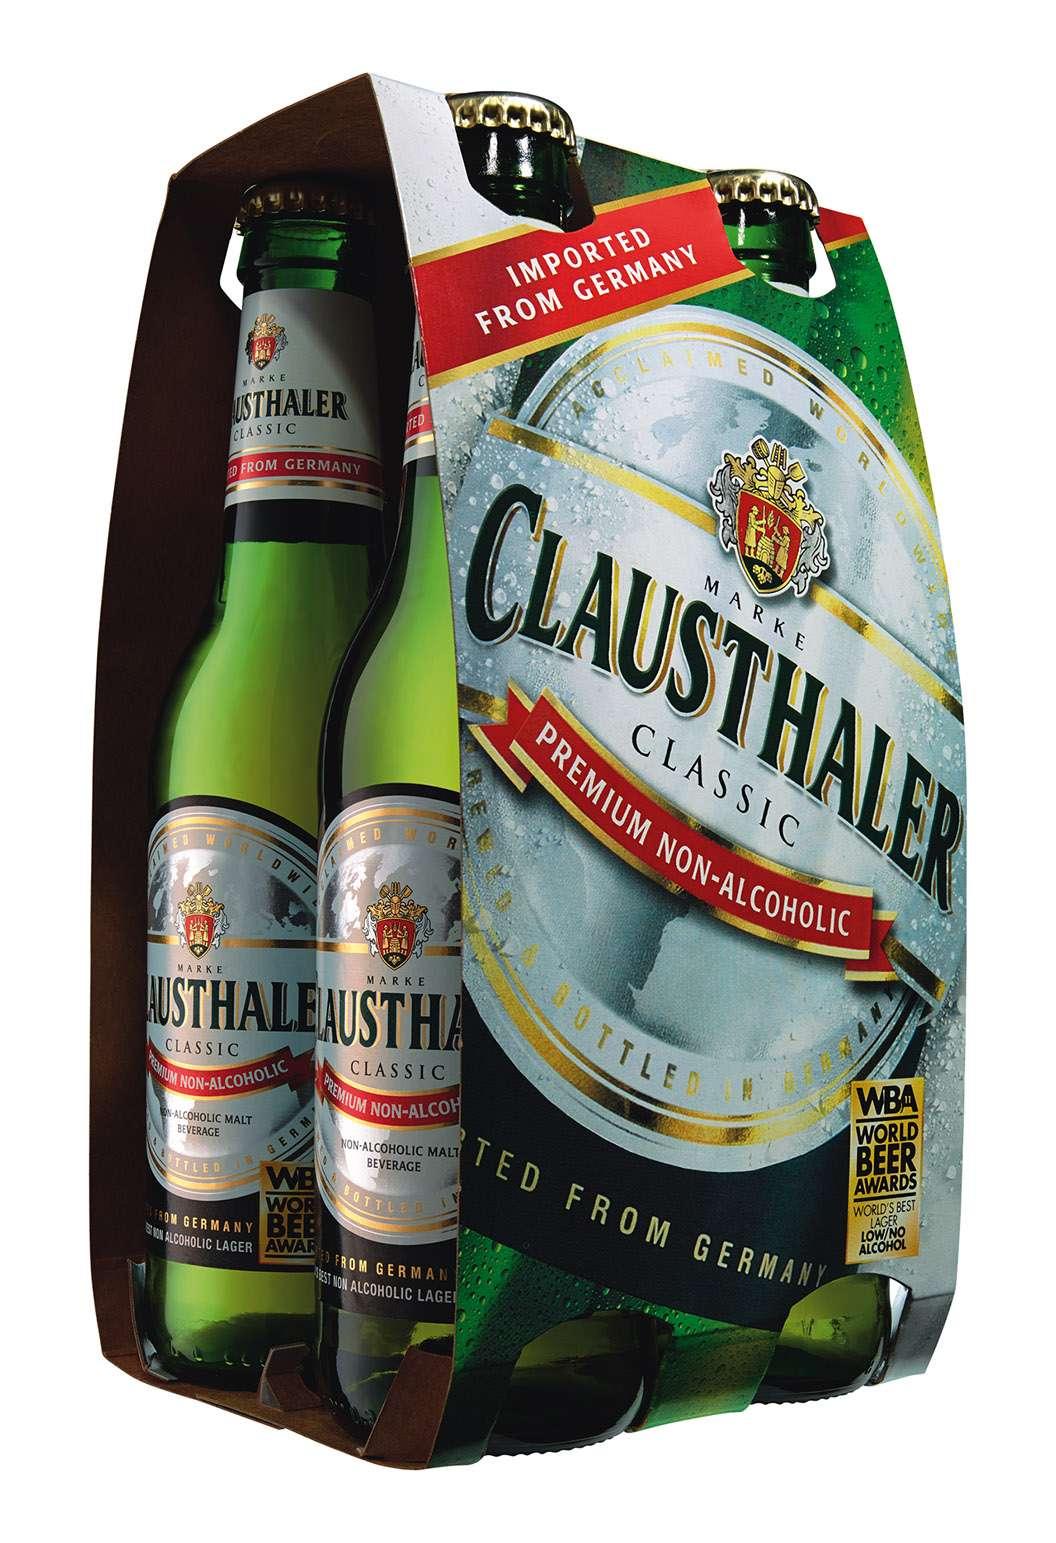 Gentileza Cerveza Clausthaler